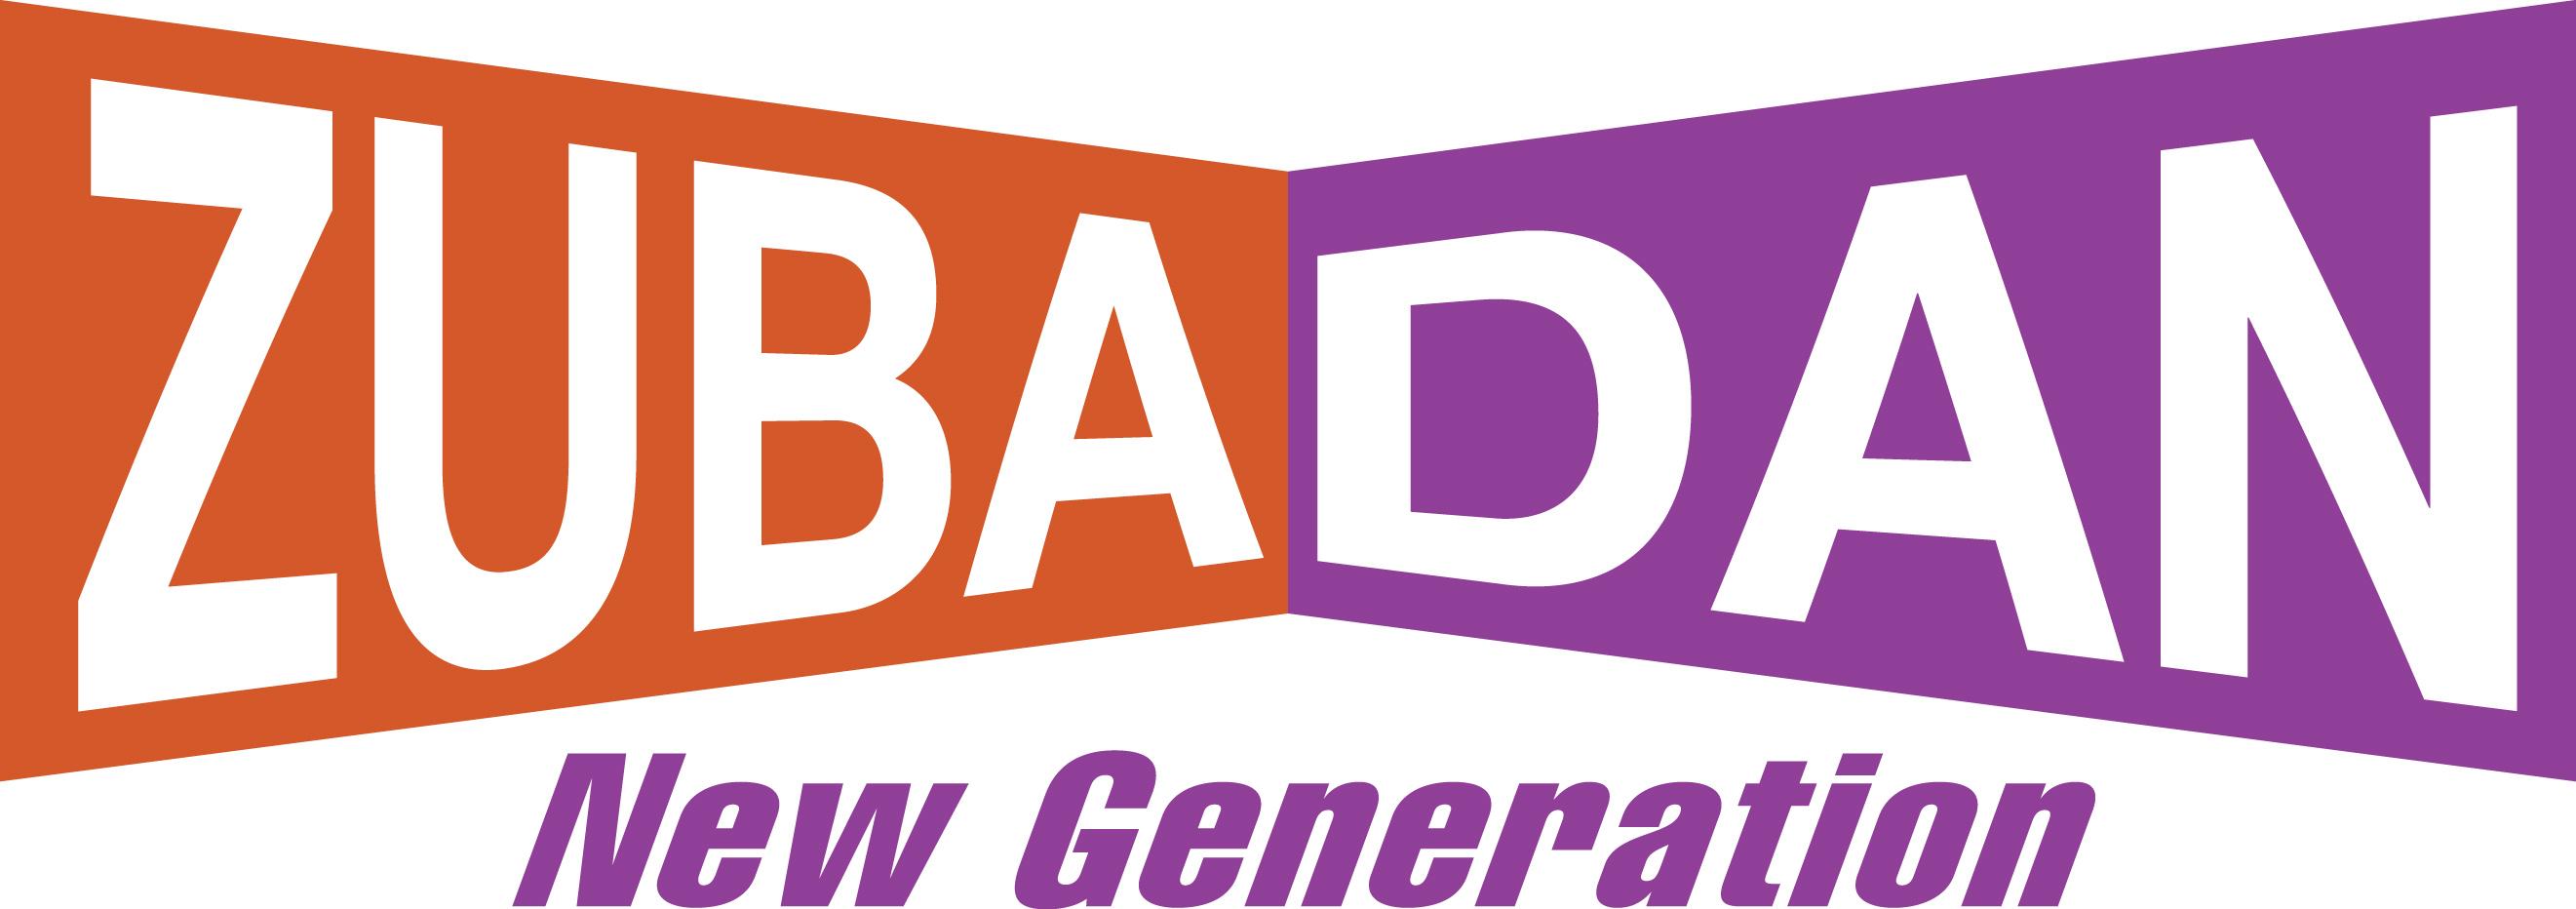 Zubadan New Generation